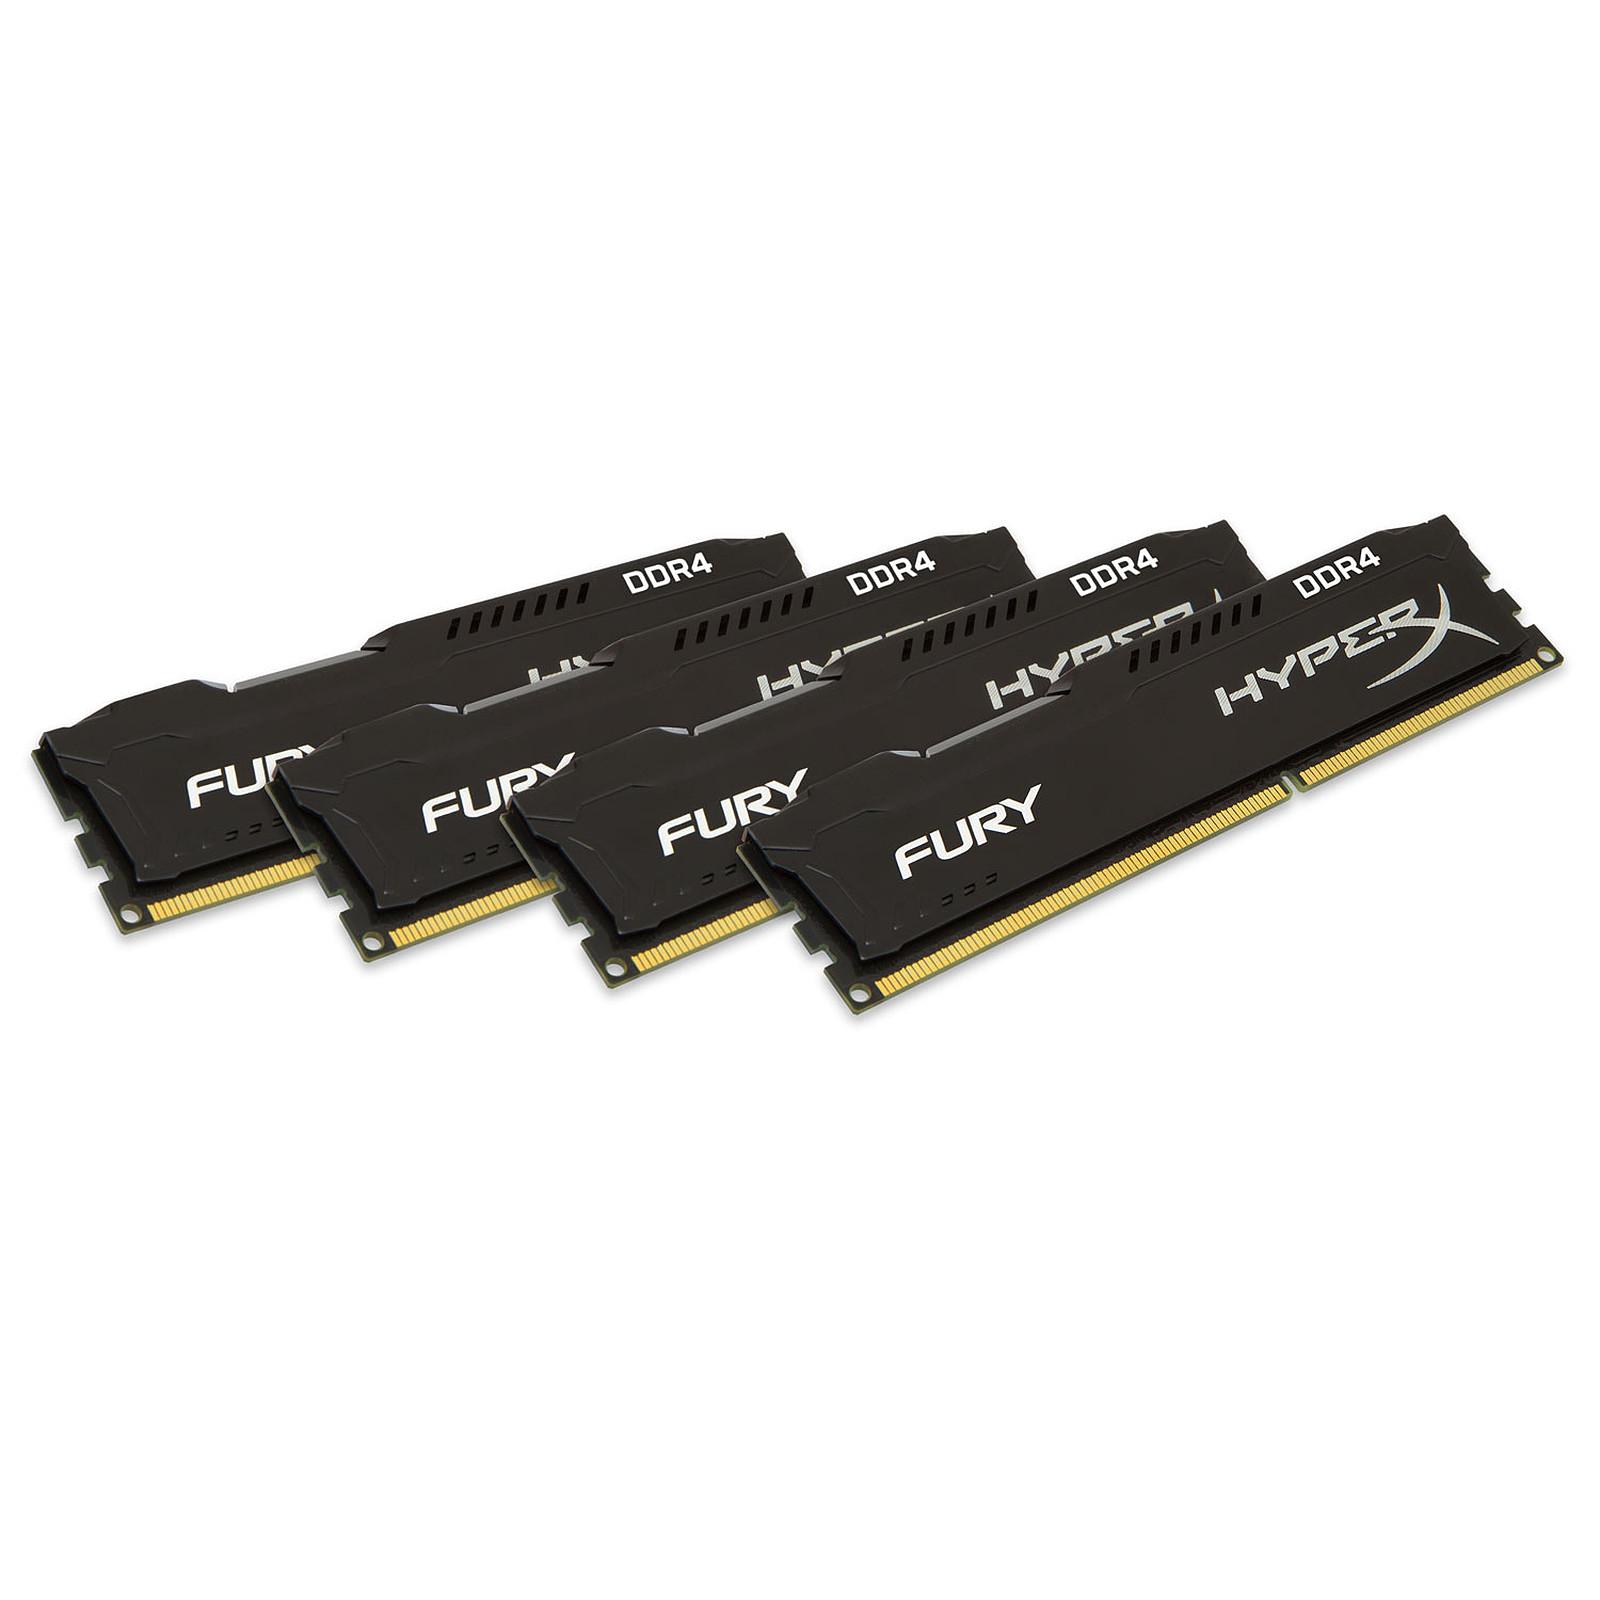 HyperX Fury Noir 32 Go (4x 8 Go) DDR4 2133 MHz CL14